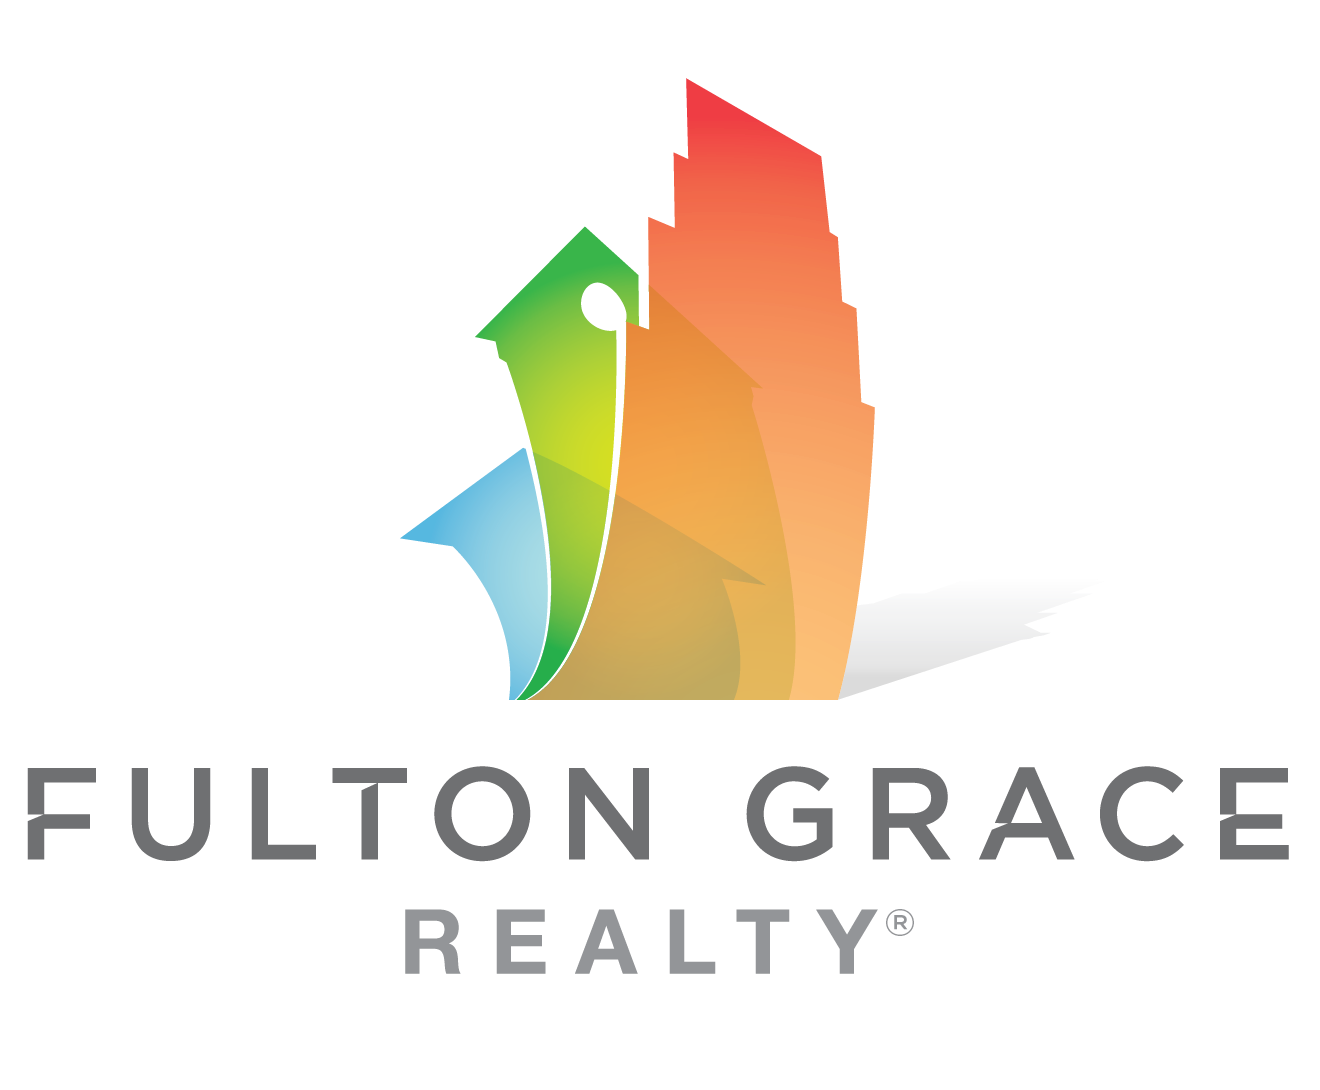 Fulton Grace realty logo